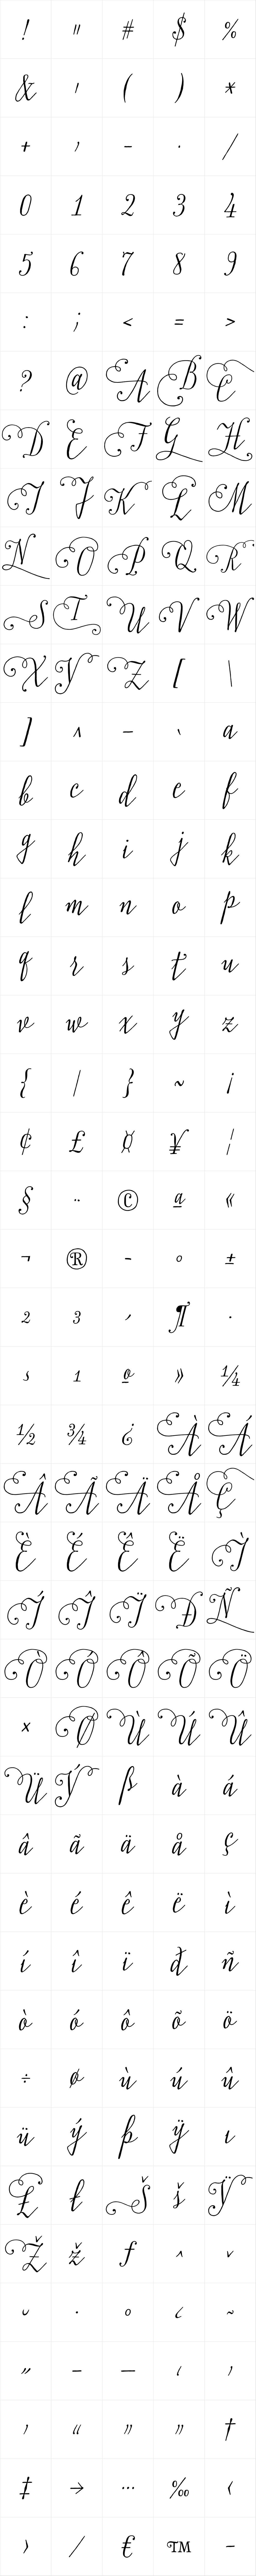 Typnic Script Swash 2